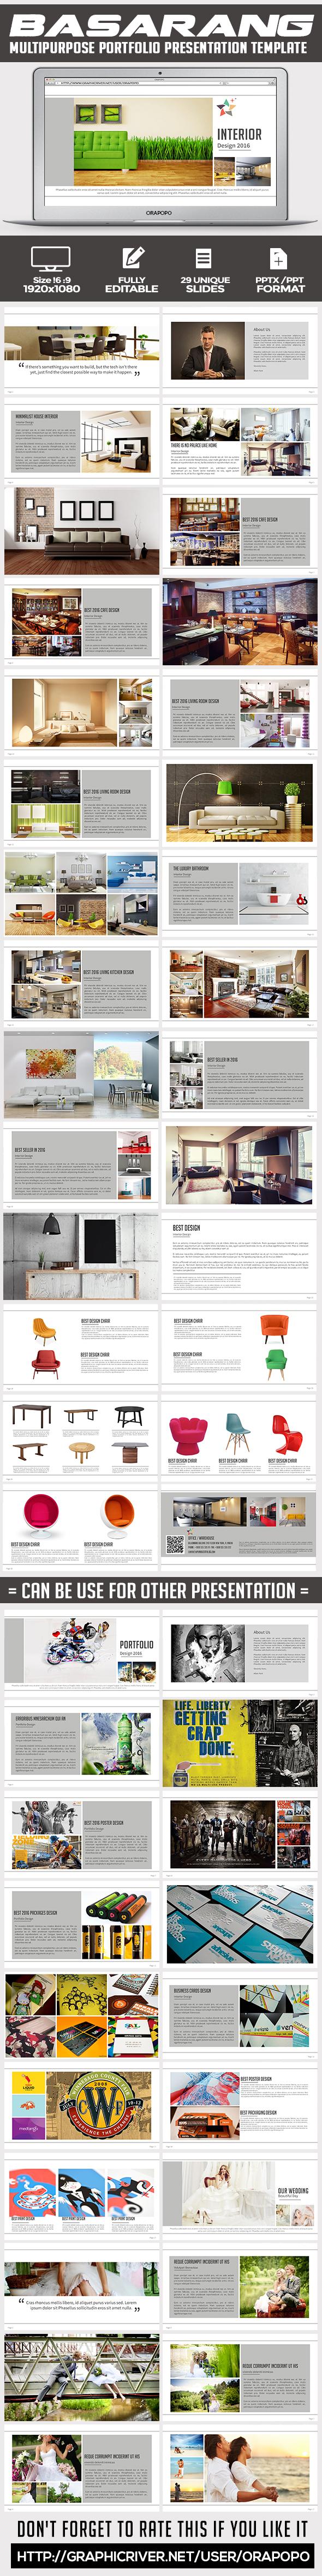 Basarang ~ Multipurpose Portfolio Presentation Template  - Creative PowerPoint Templates